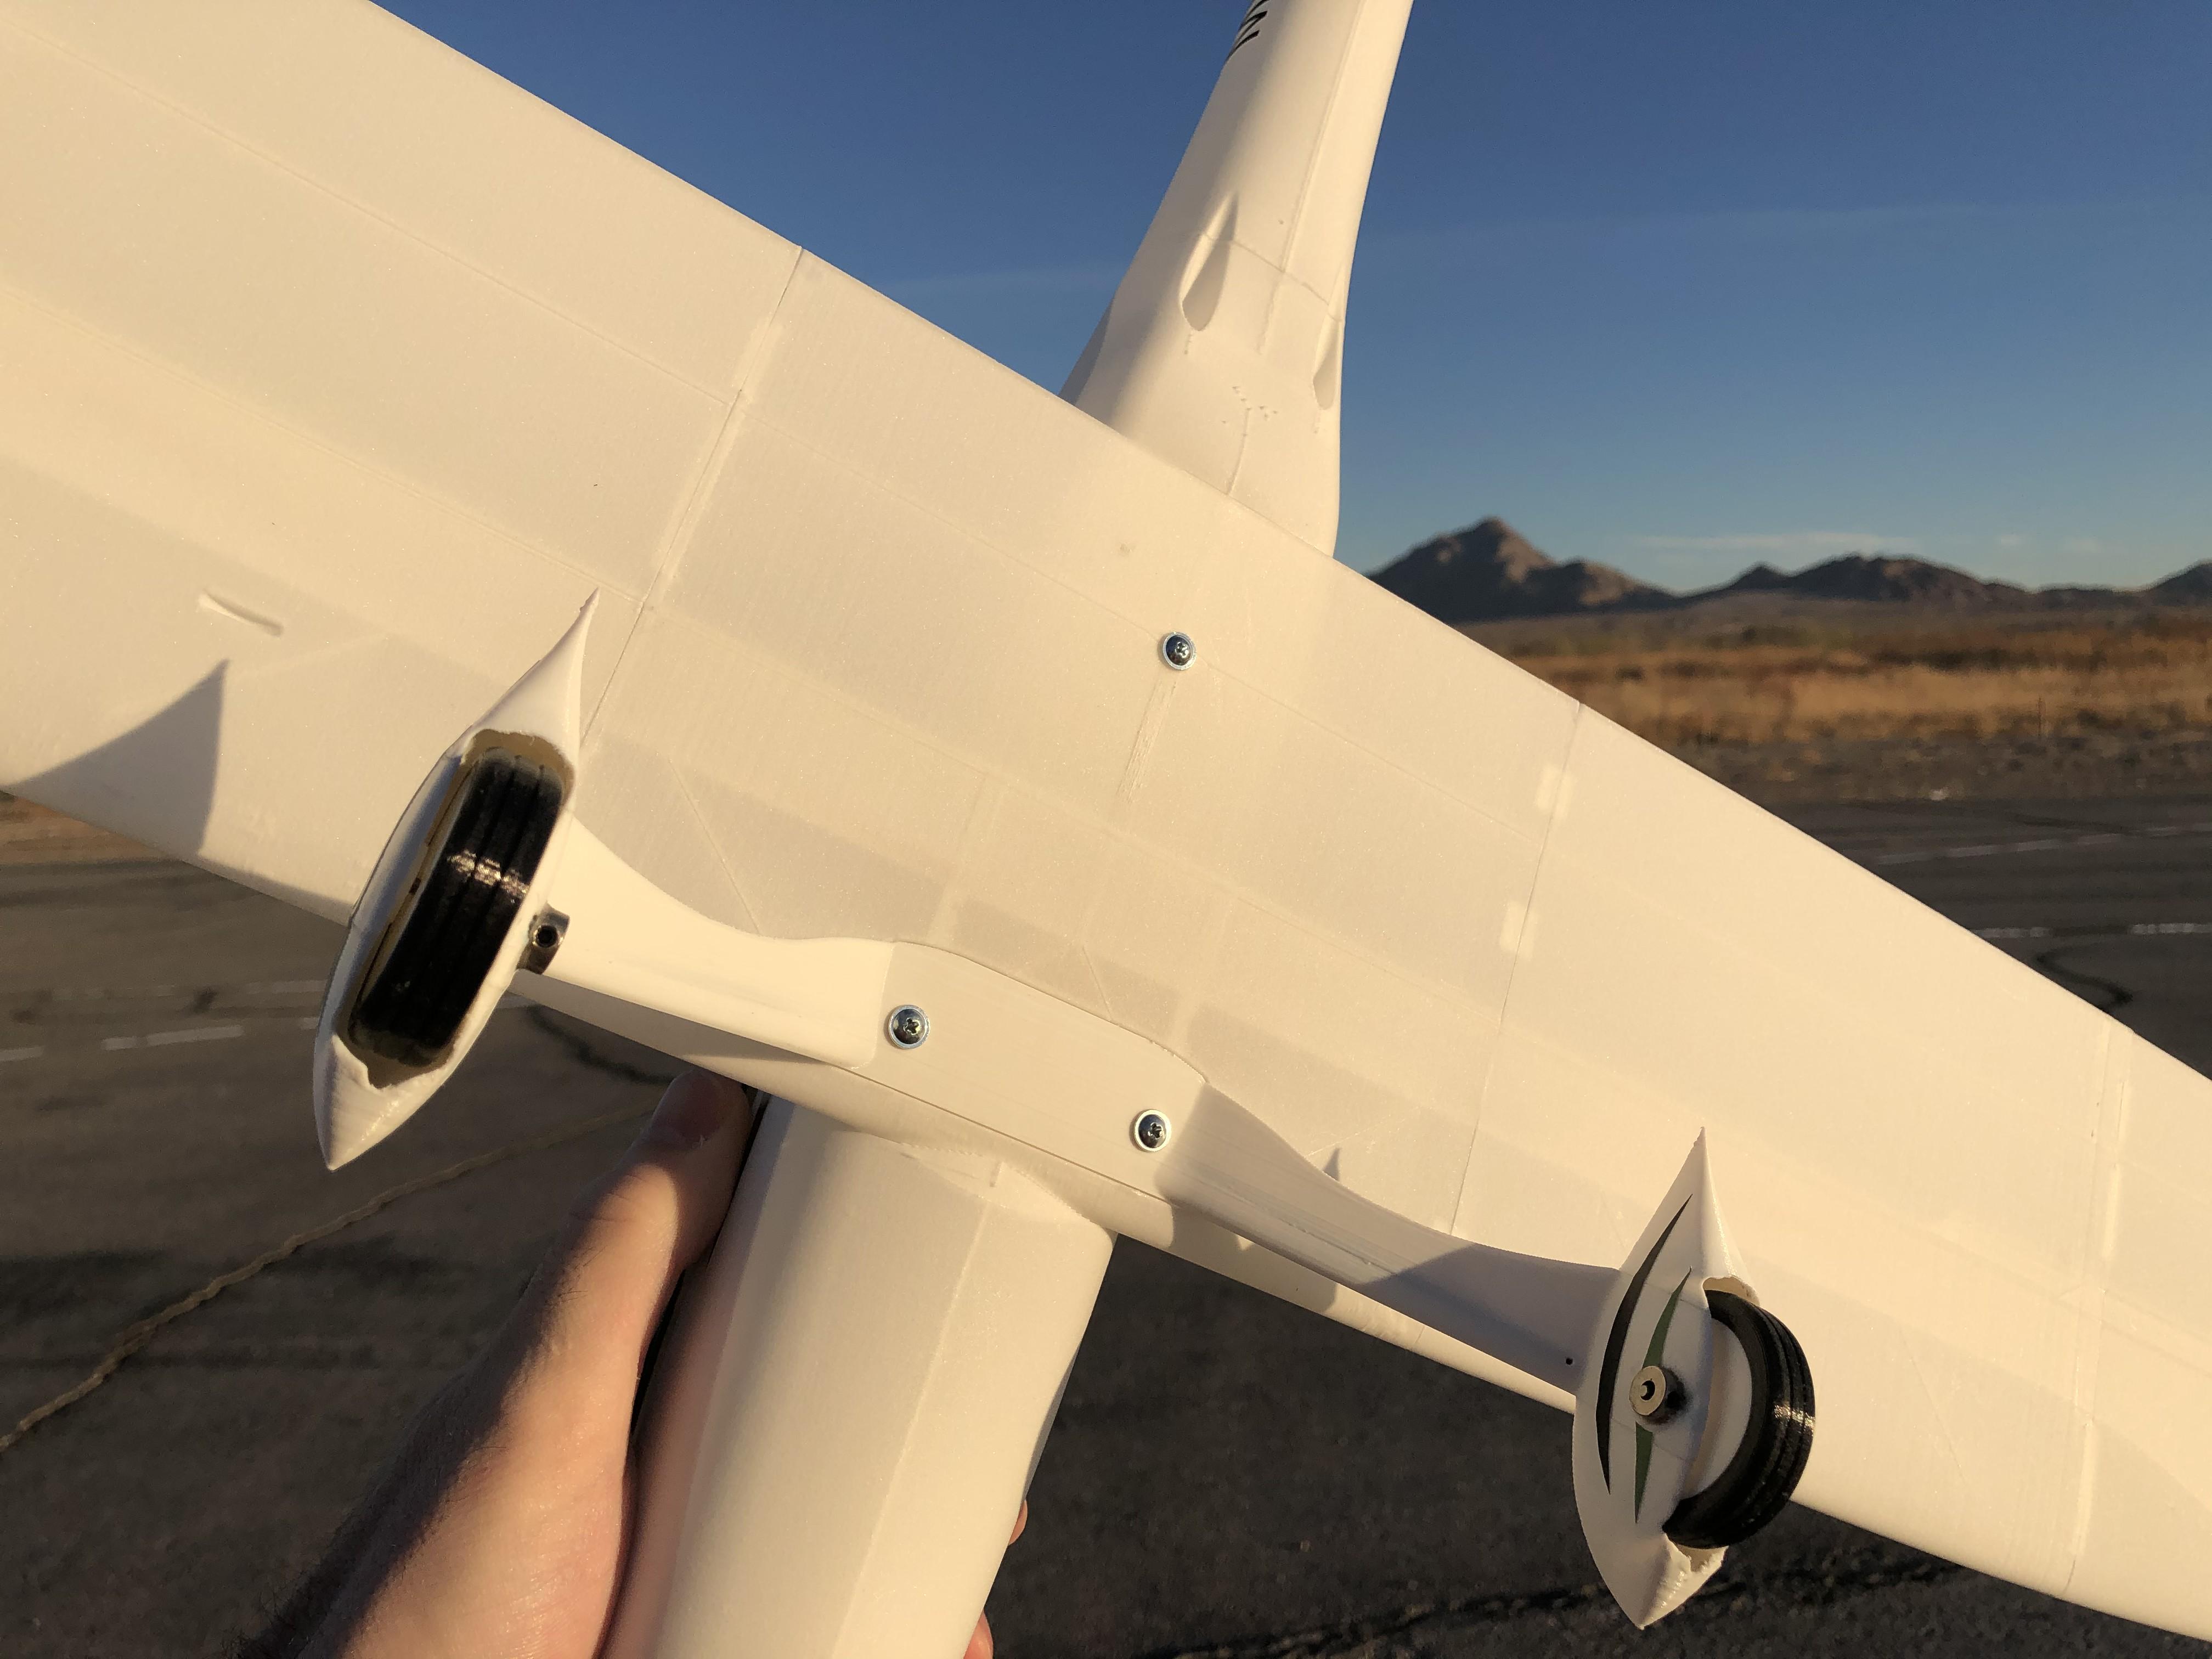 Stronger landing gear